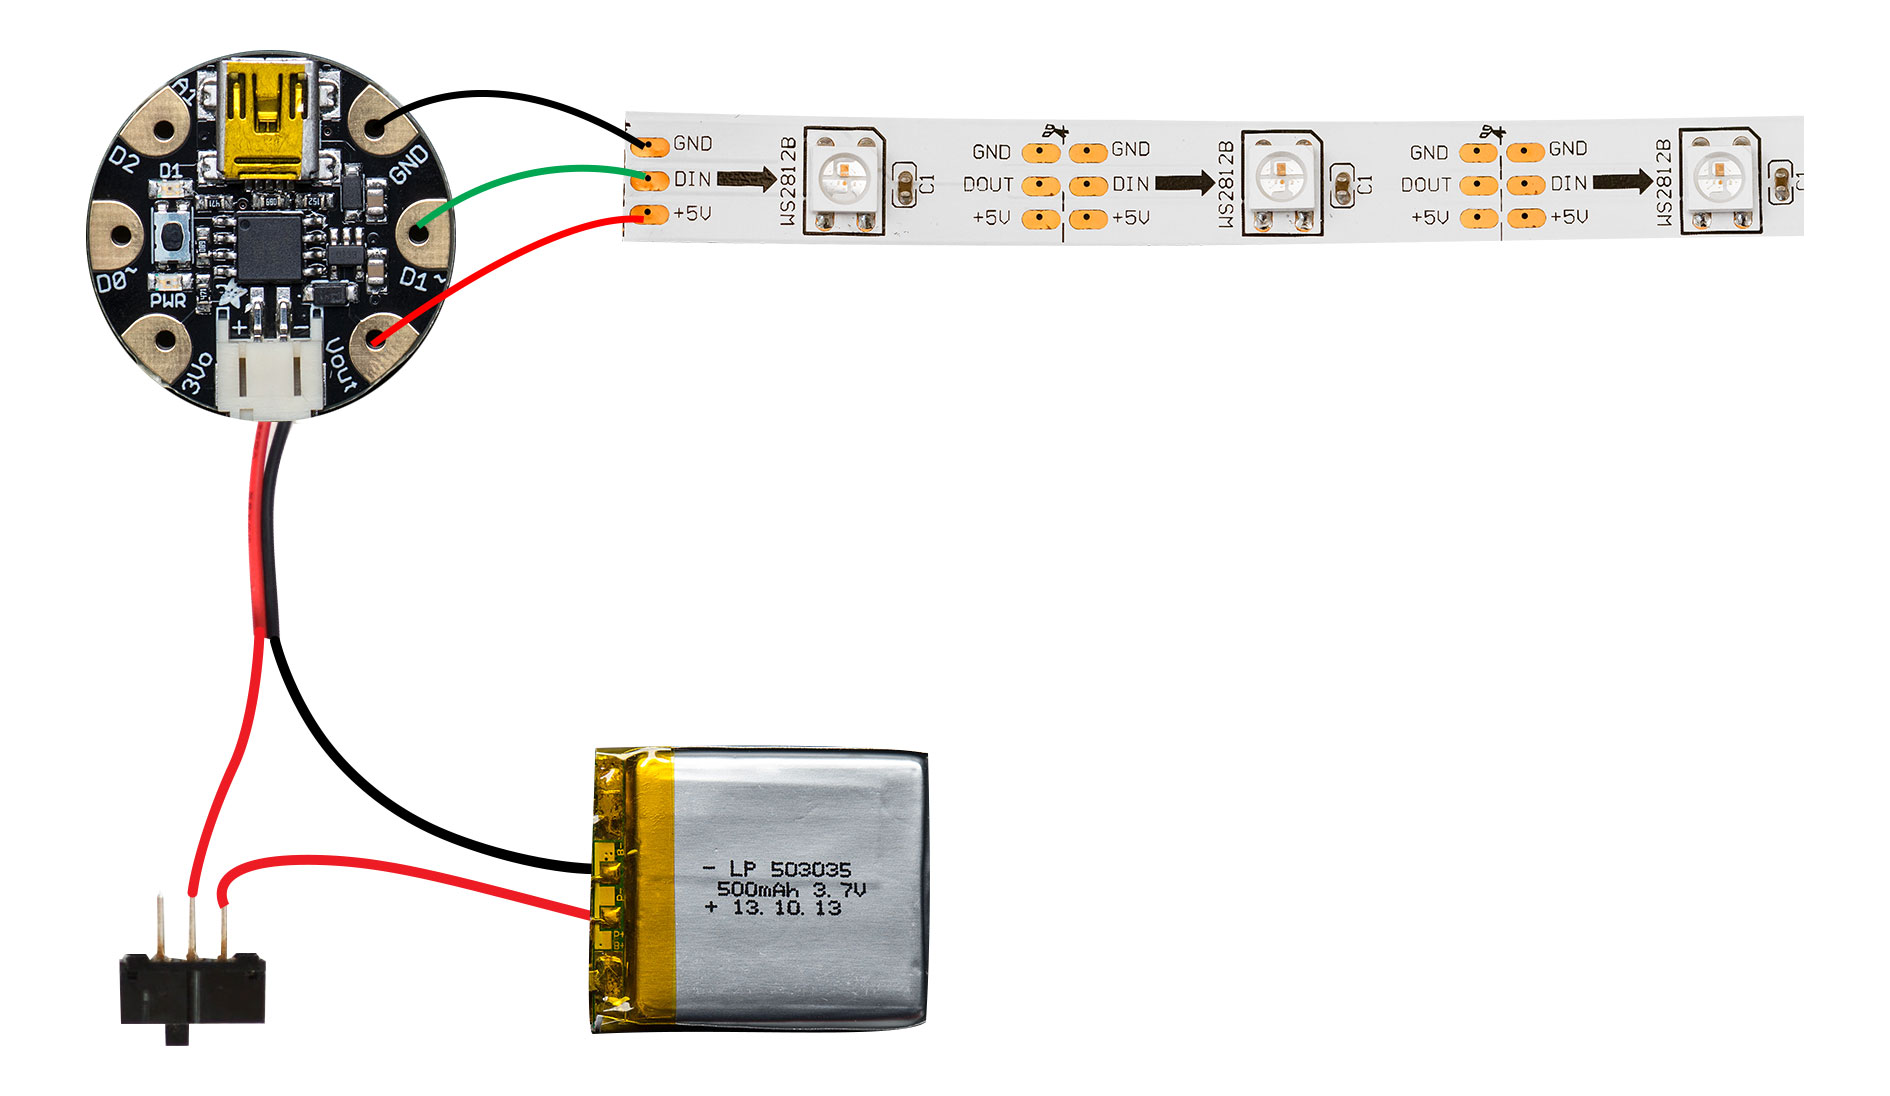 gemma_treeTop-circuit-Layout.jpg